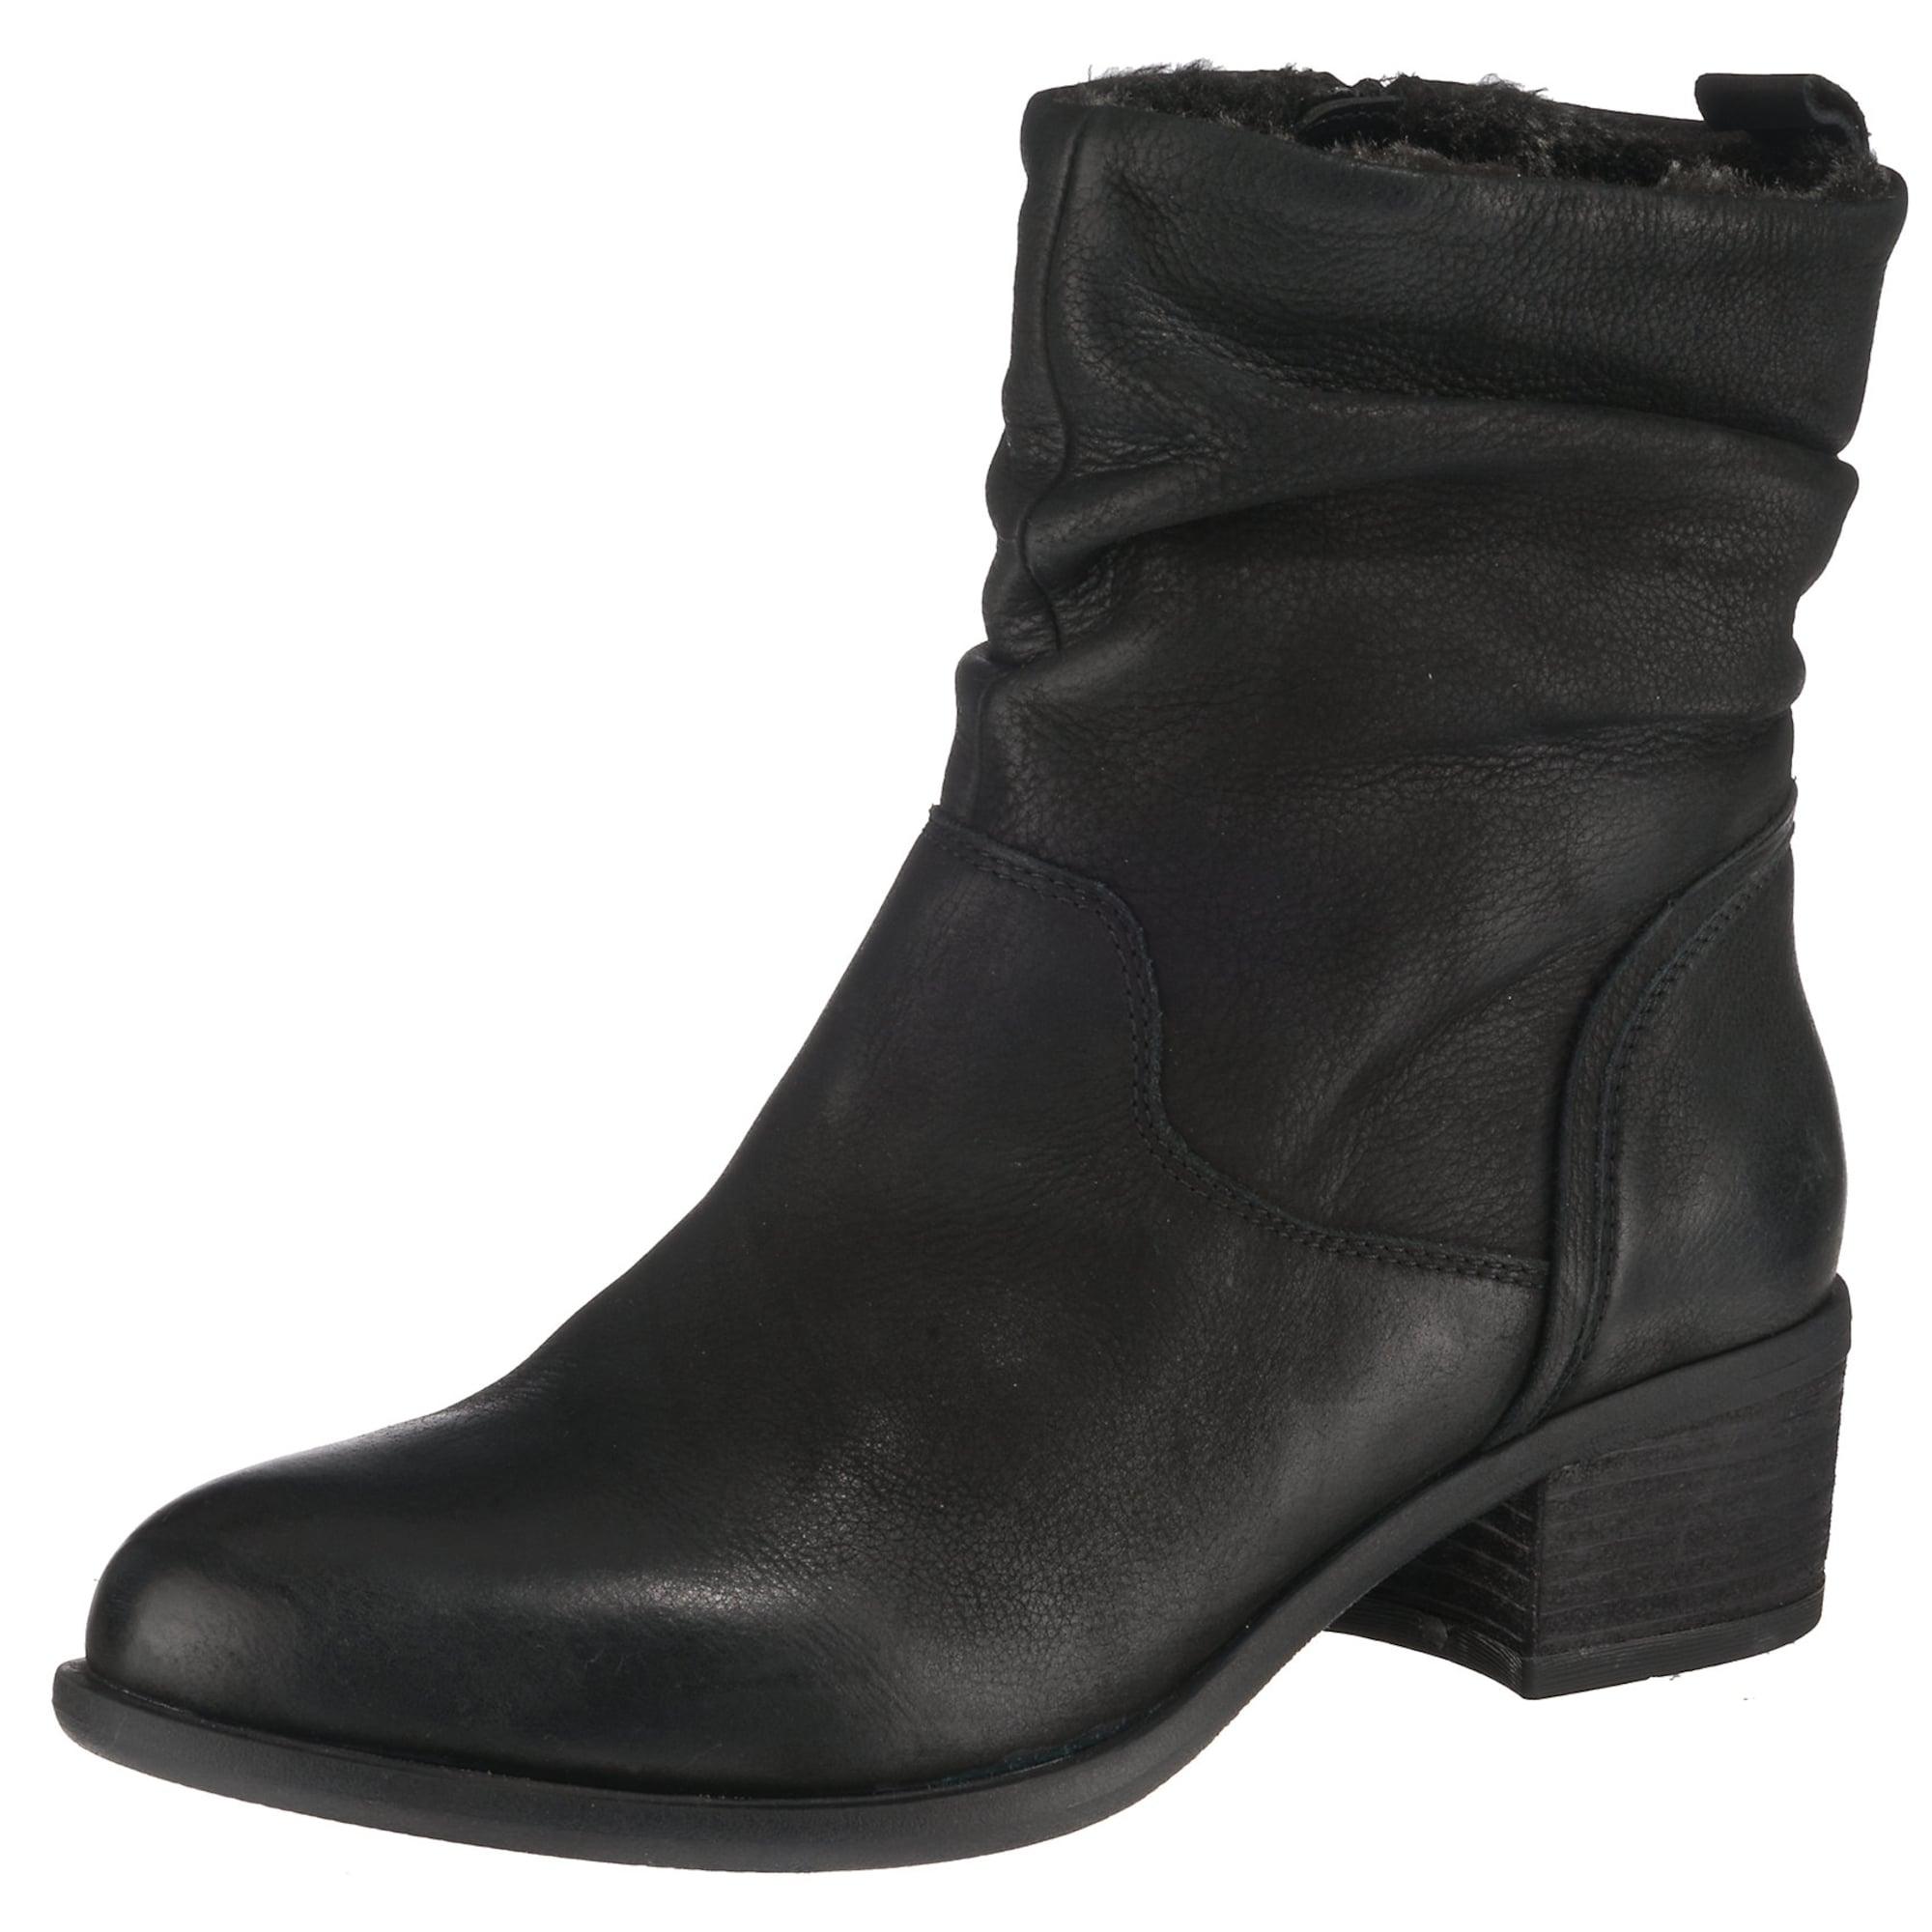 Stiefeletten | Schuhe > Stiefeletten | SPM